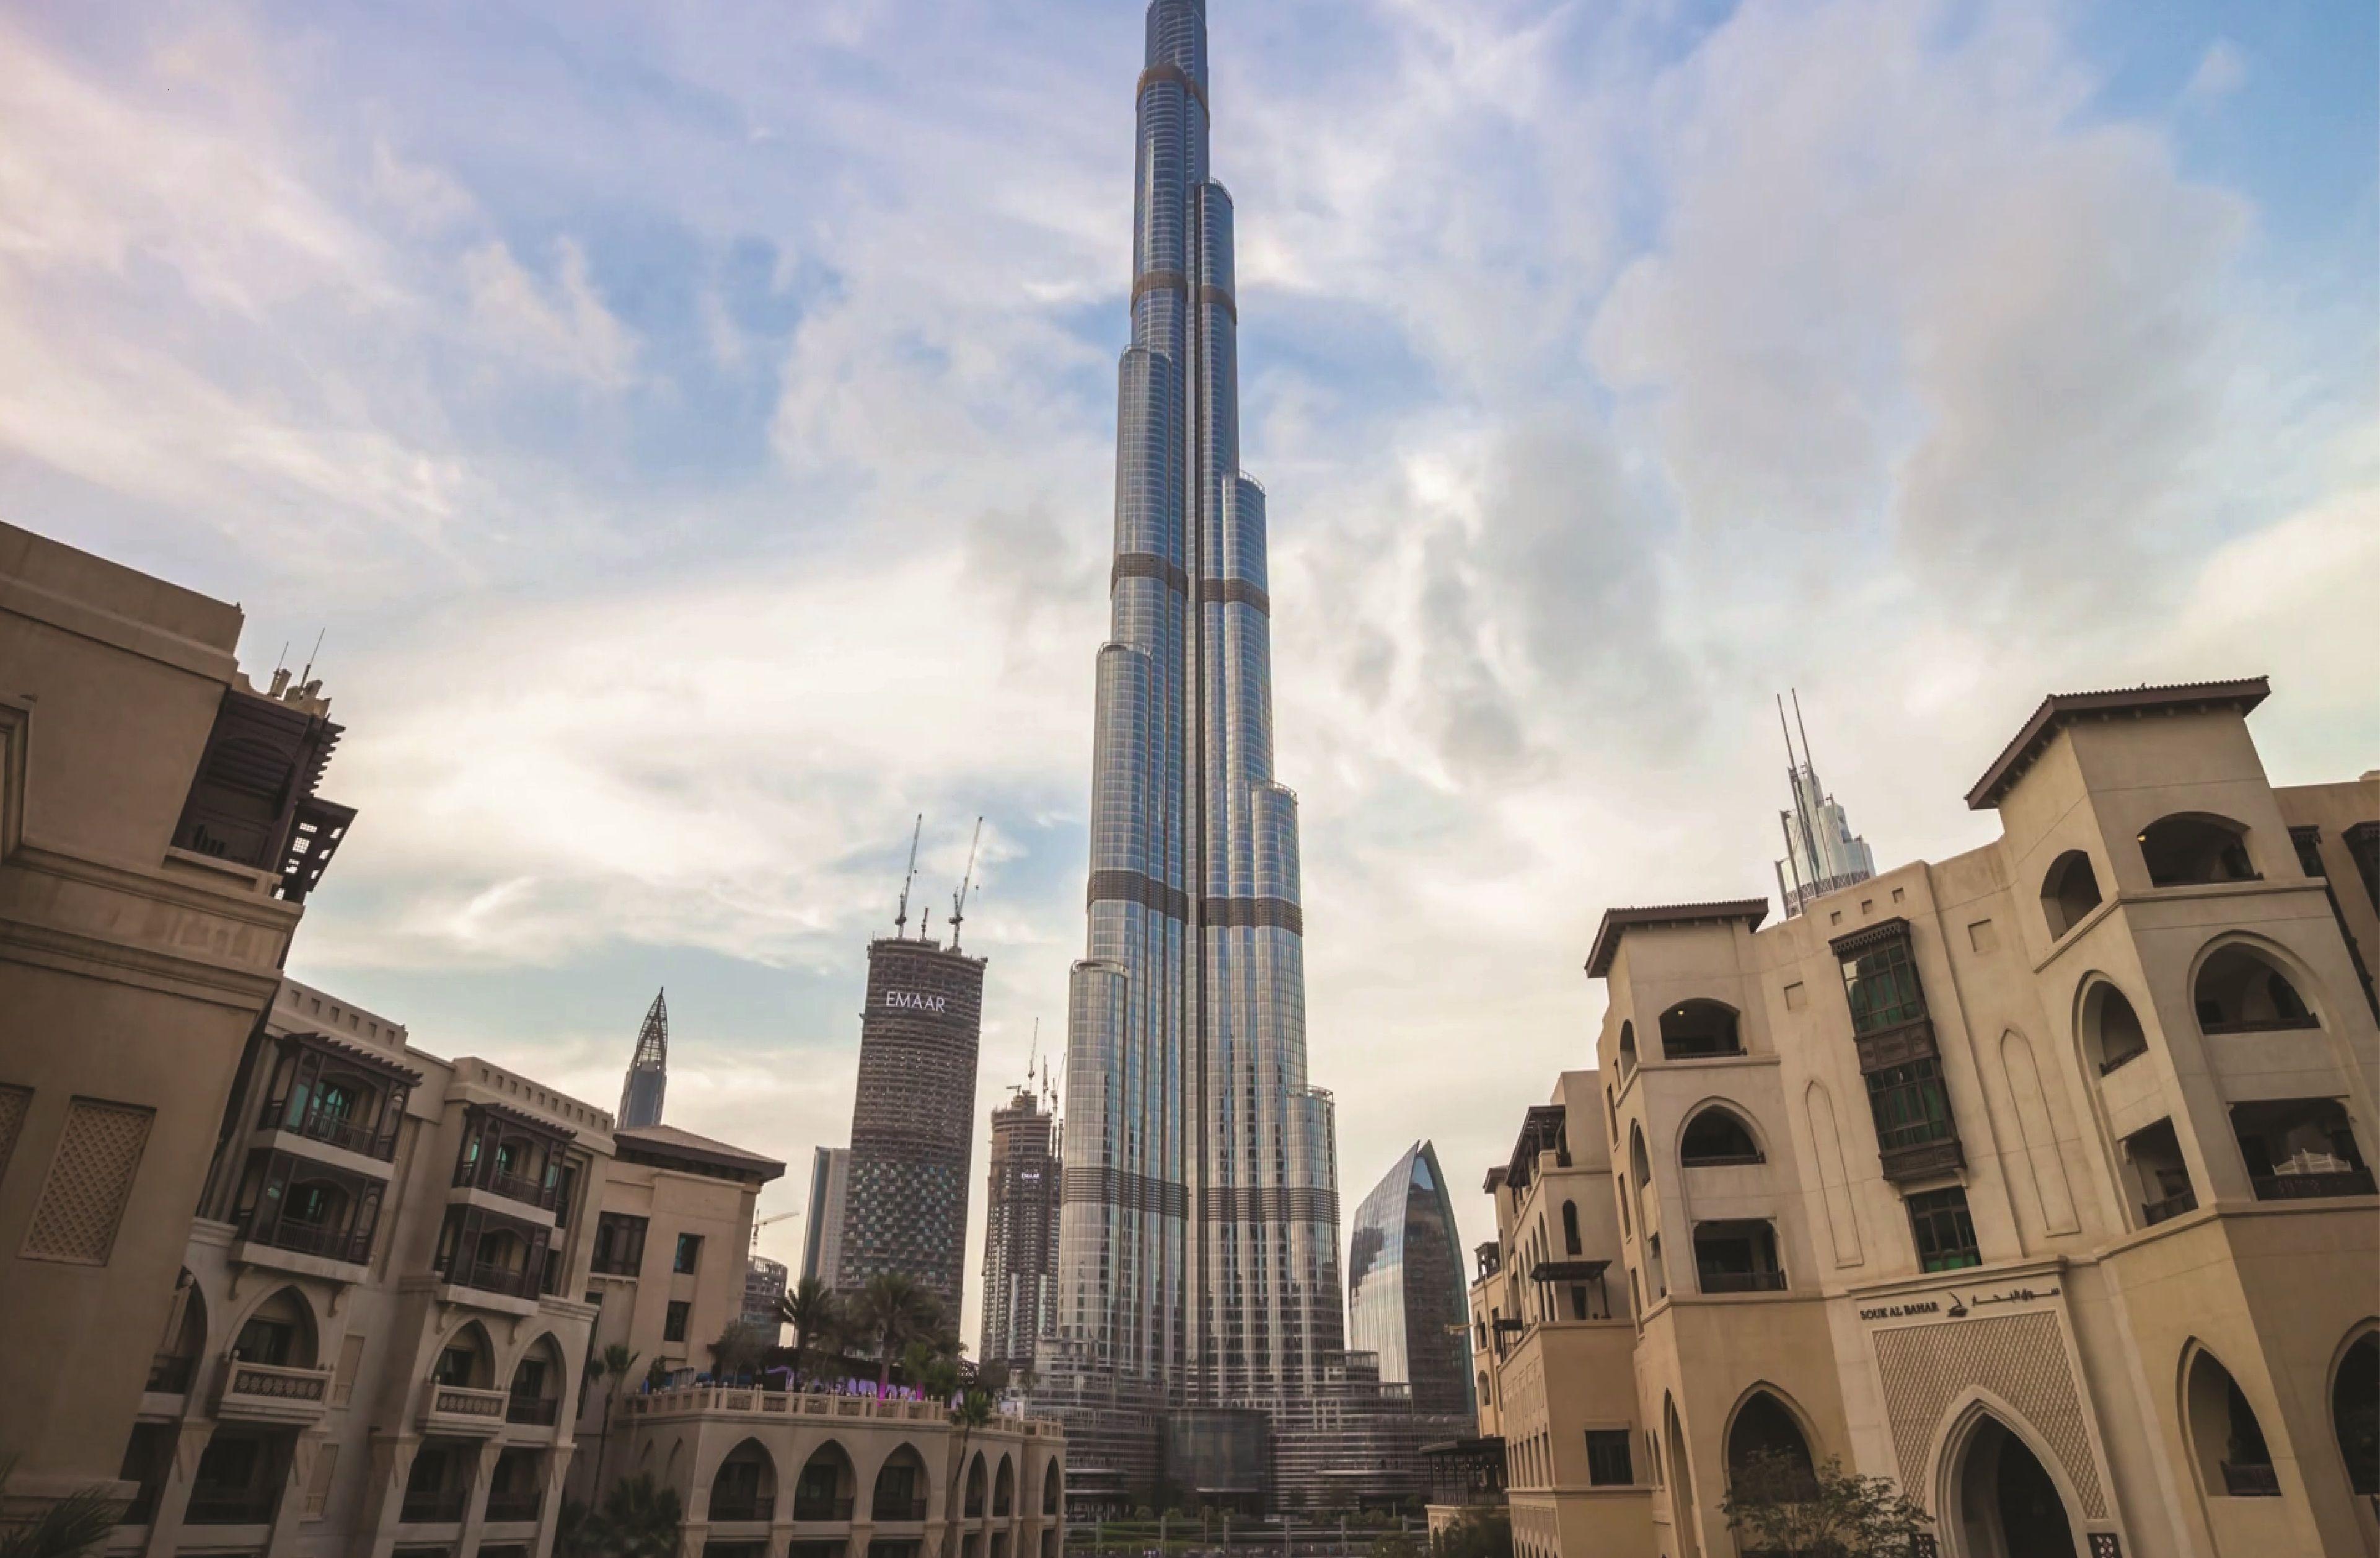 Dubai half day tour with Burj Khalifa from Dubai